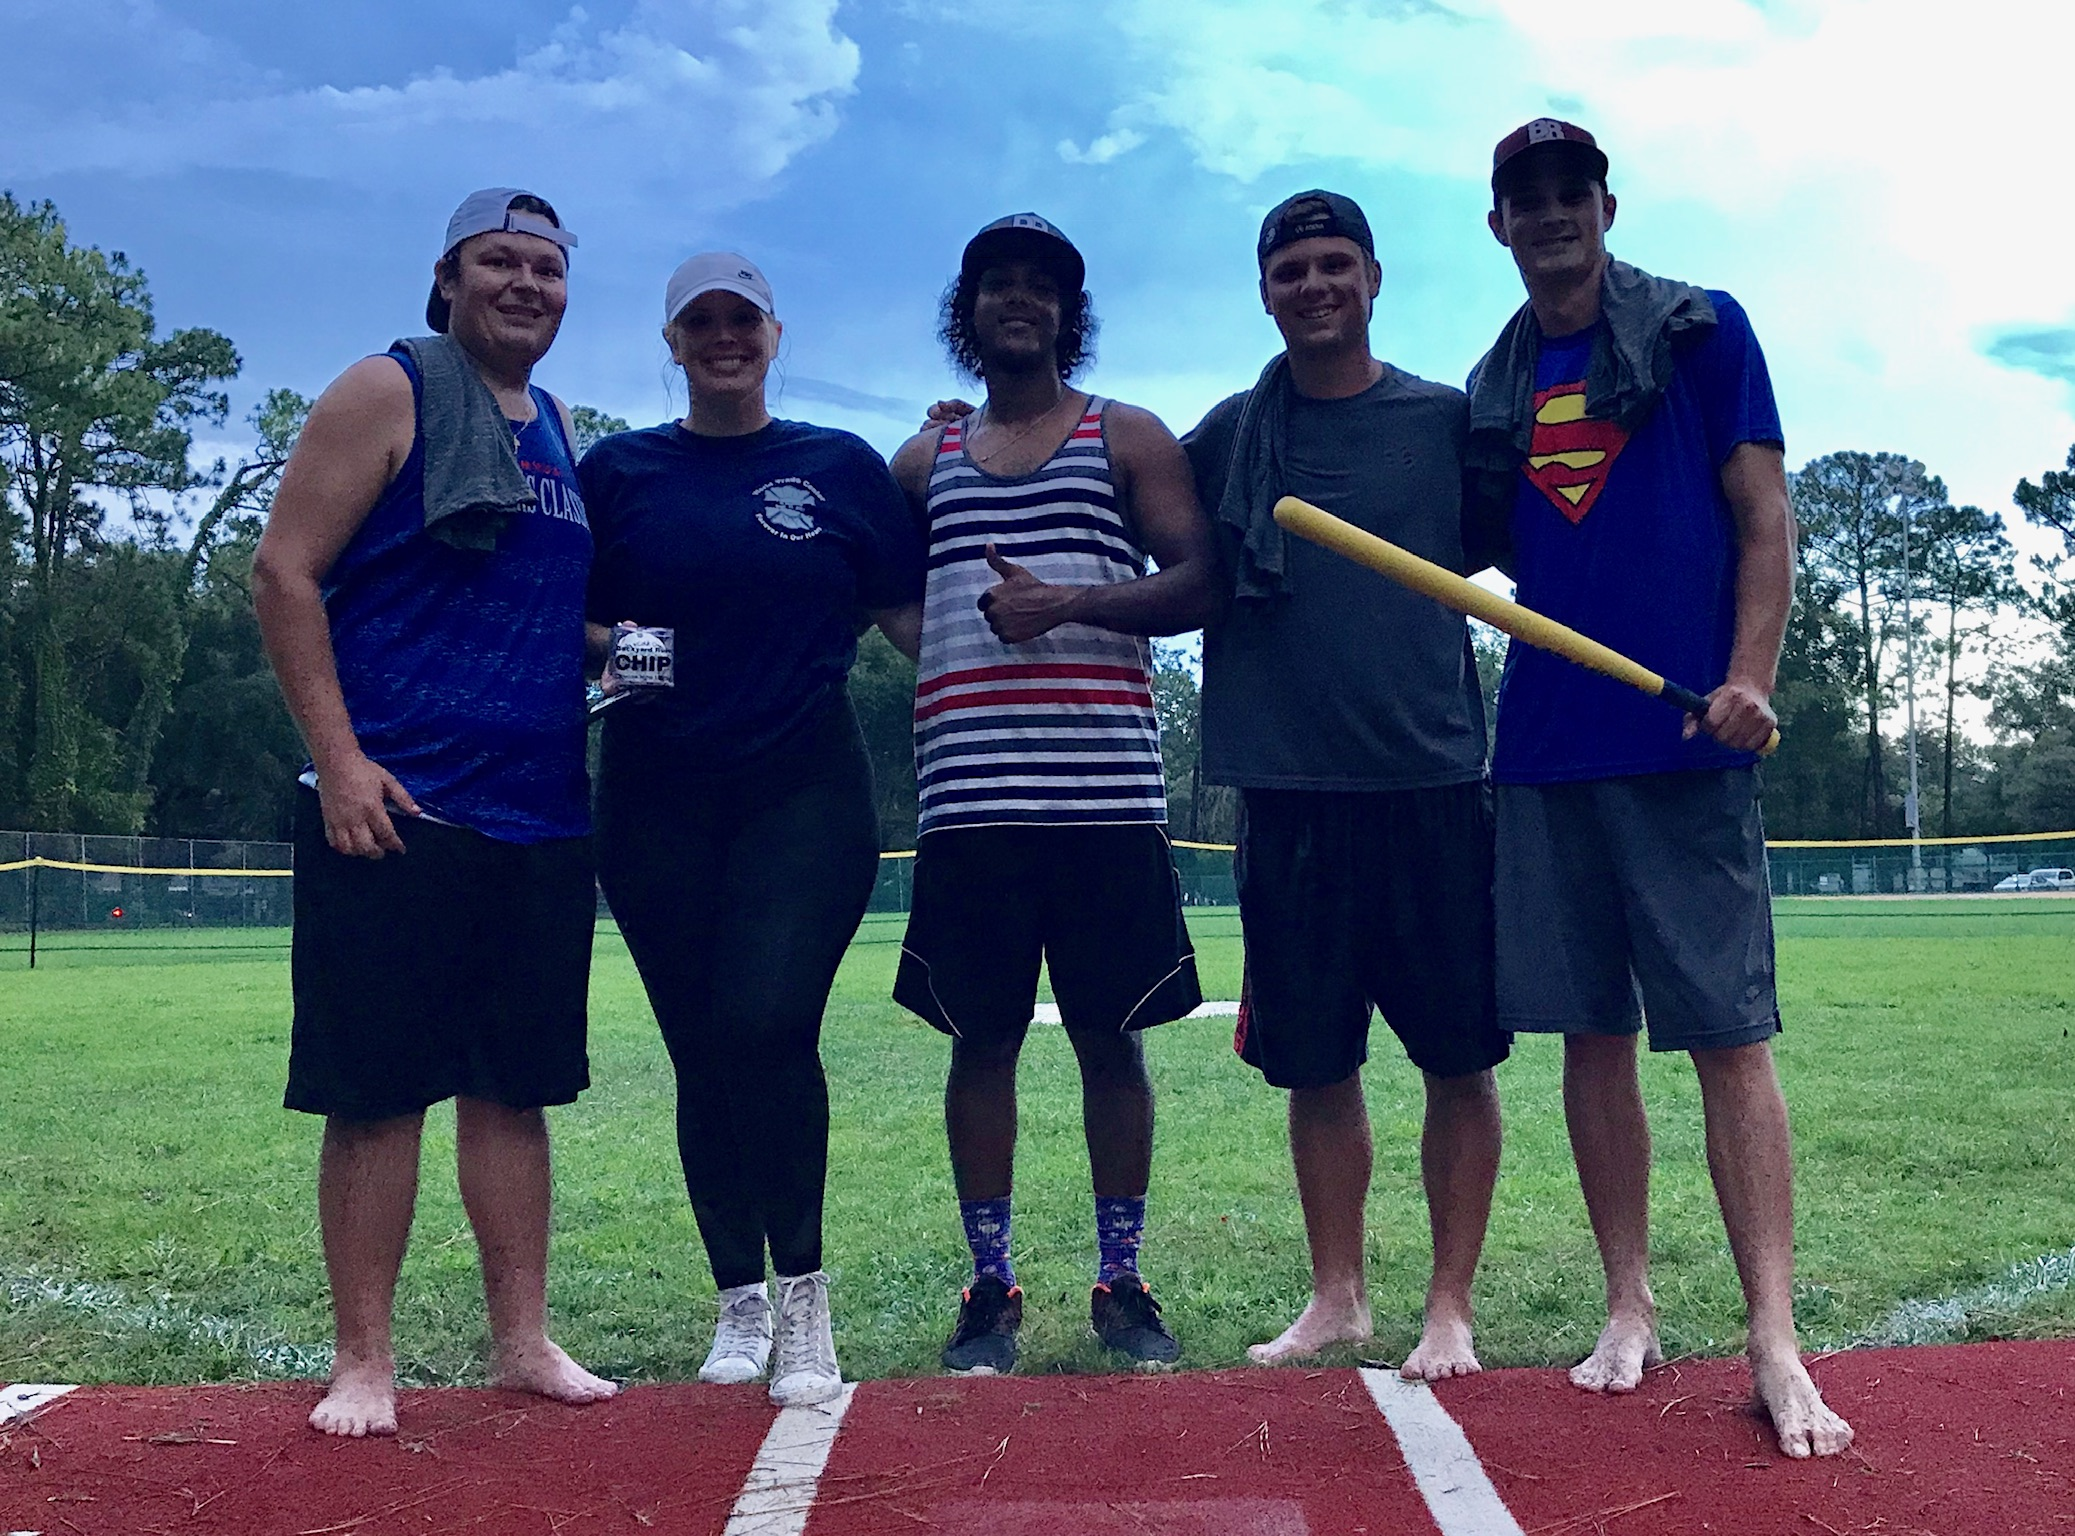 ChampionCHIP: Hrs + Cold Ones - Gainesville, FL - 7/20/19